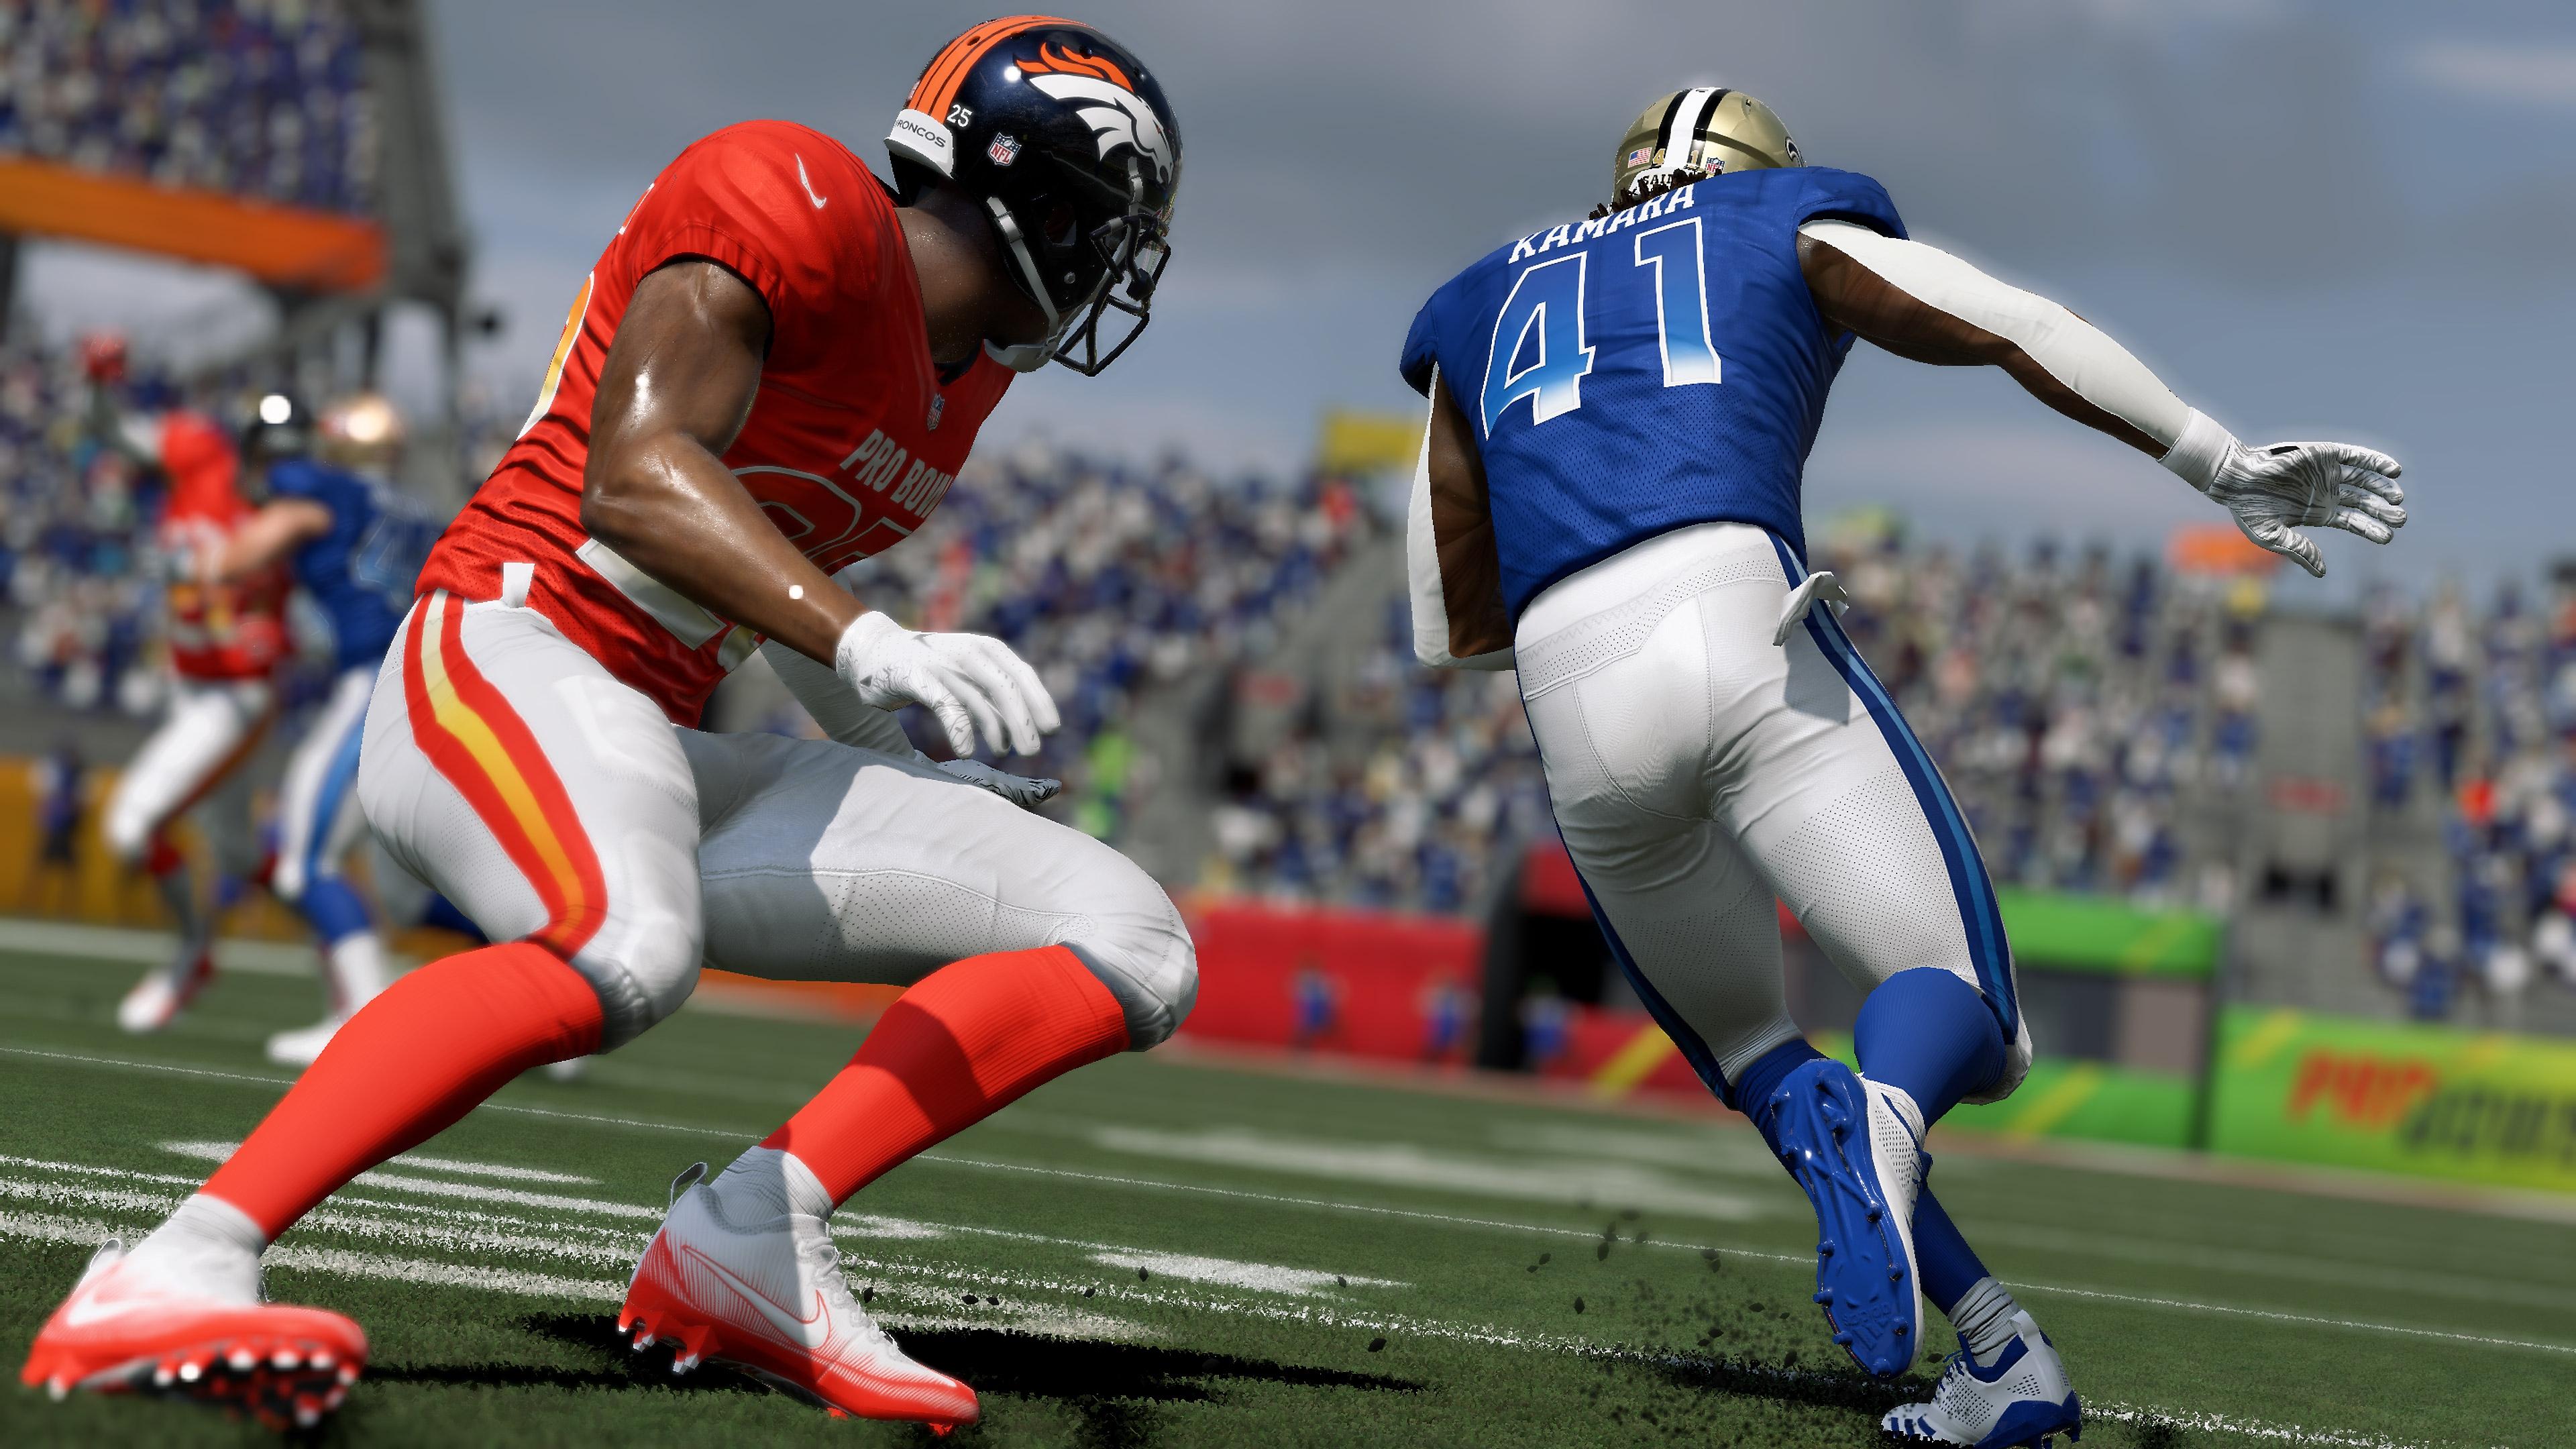 Madden NFL 20 - Captura de pantalla de galería 2